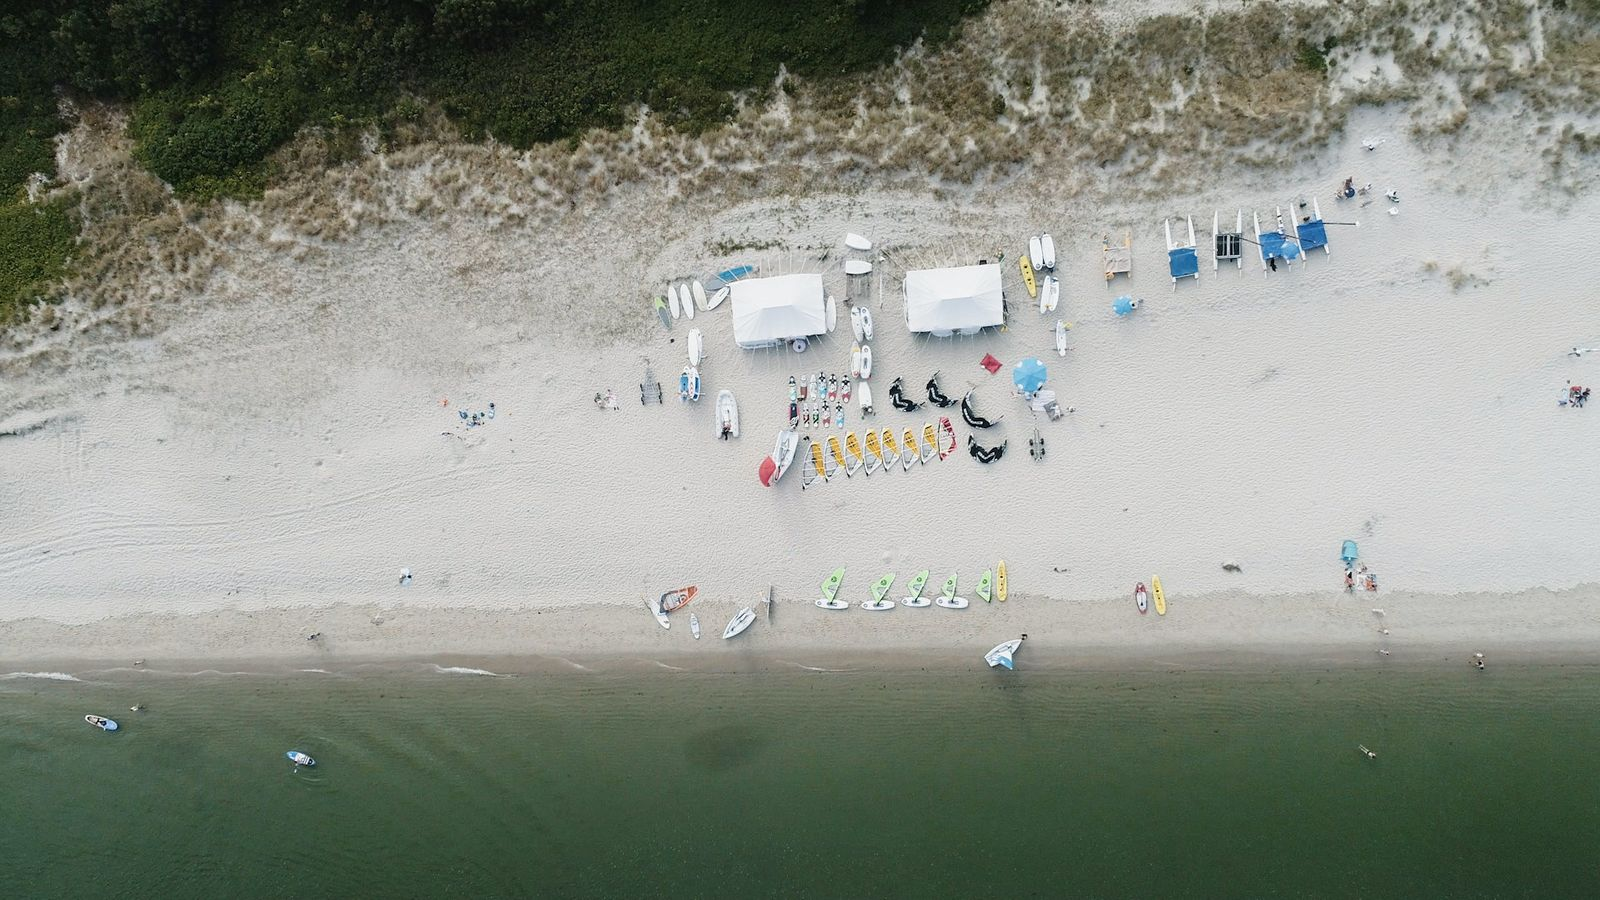 EINMALIGE VERWENDUNG Jeden Tag Meer - Surf-Camps in Europa